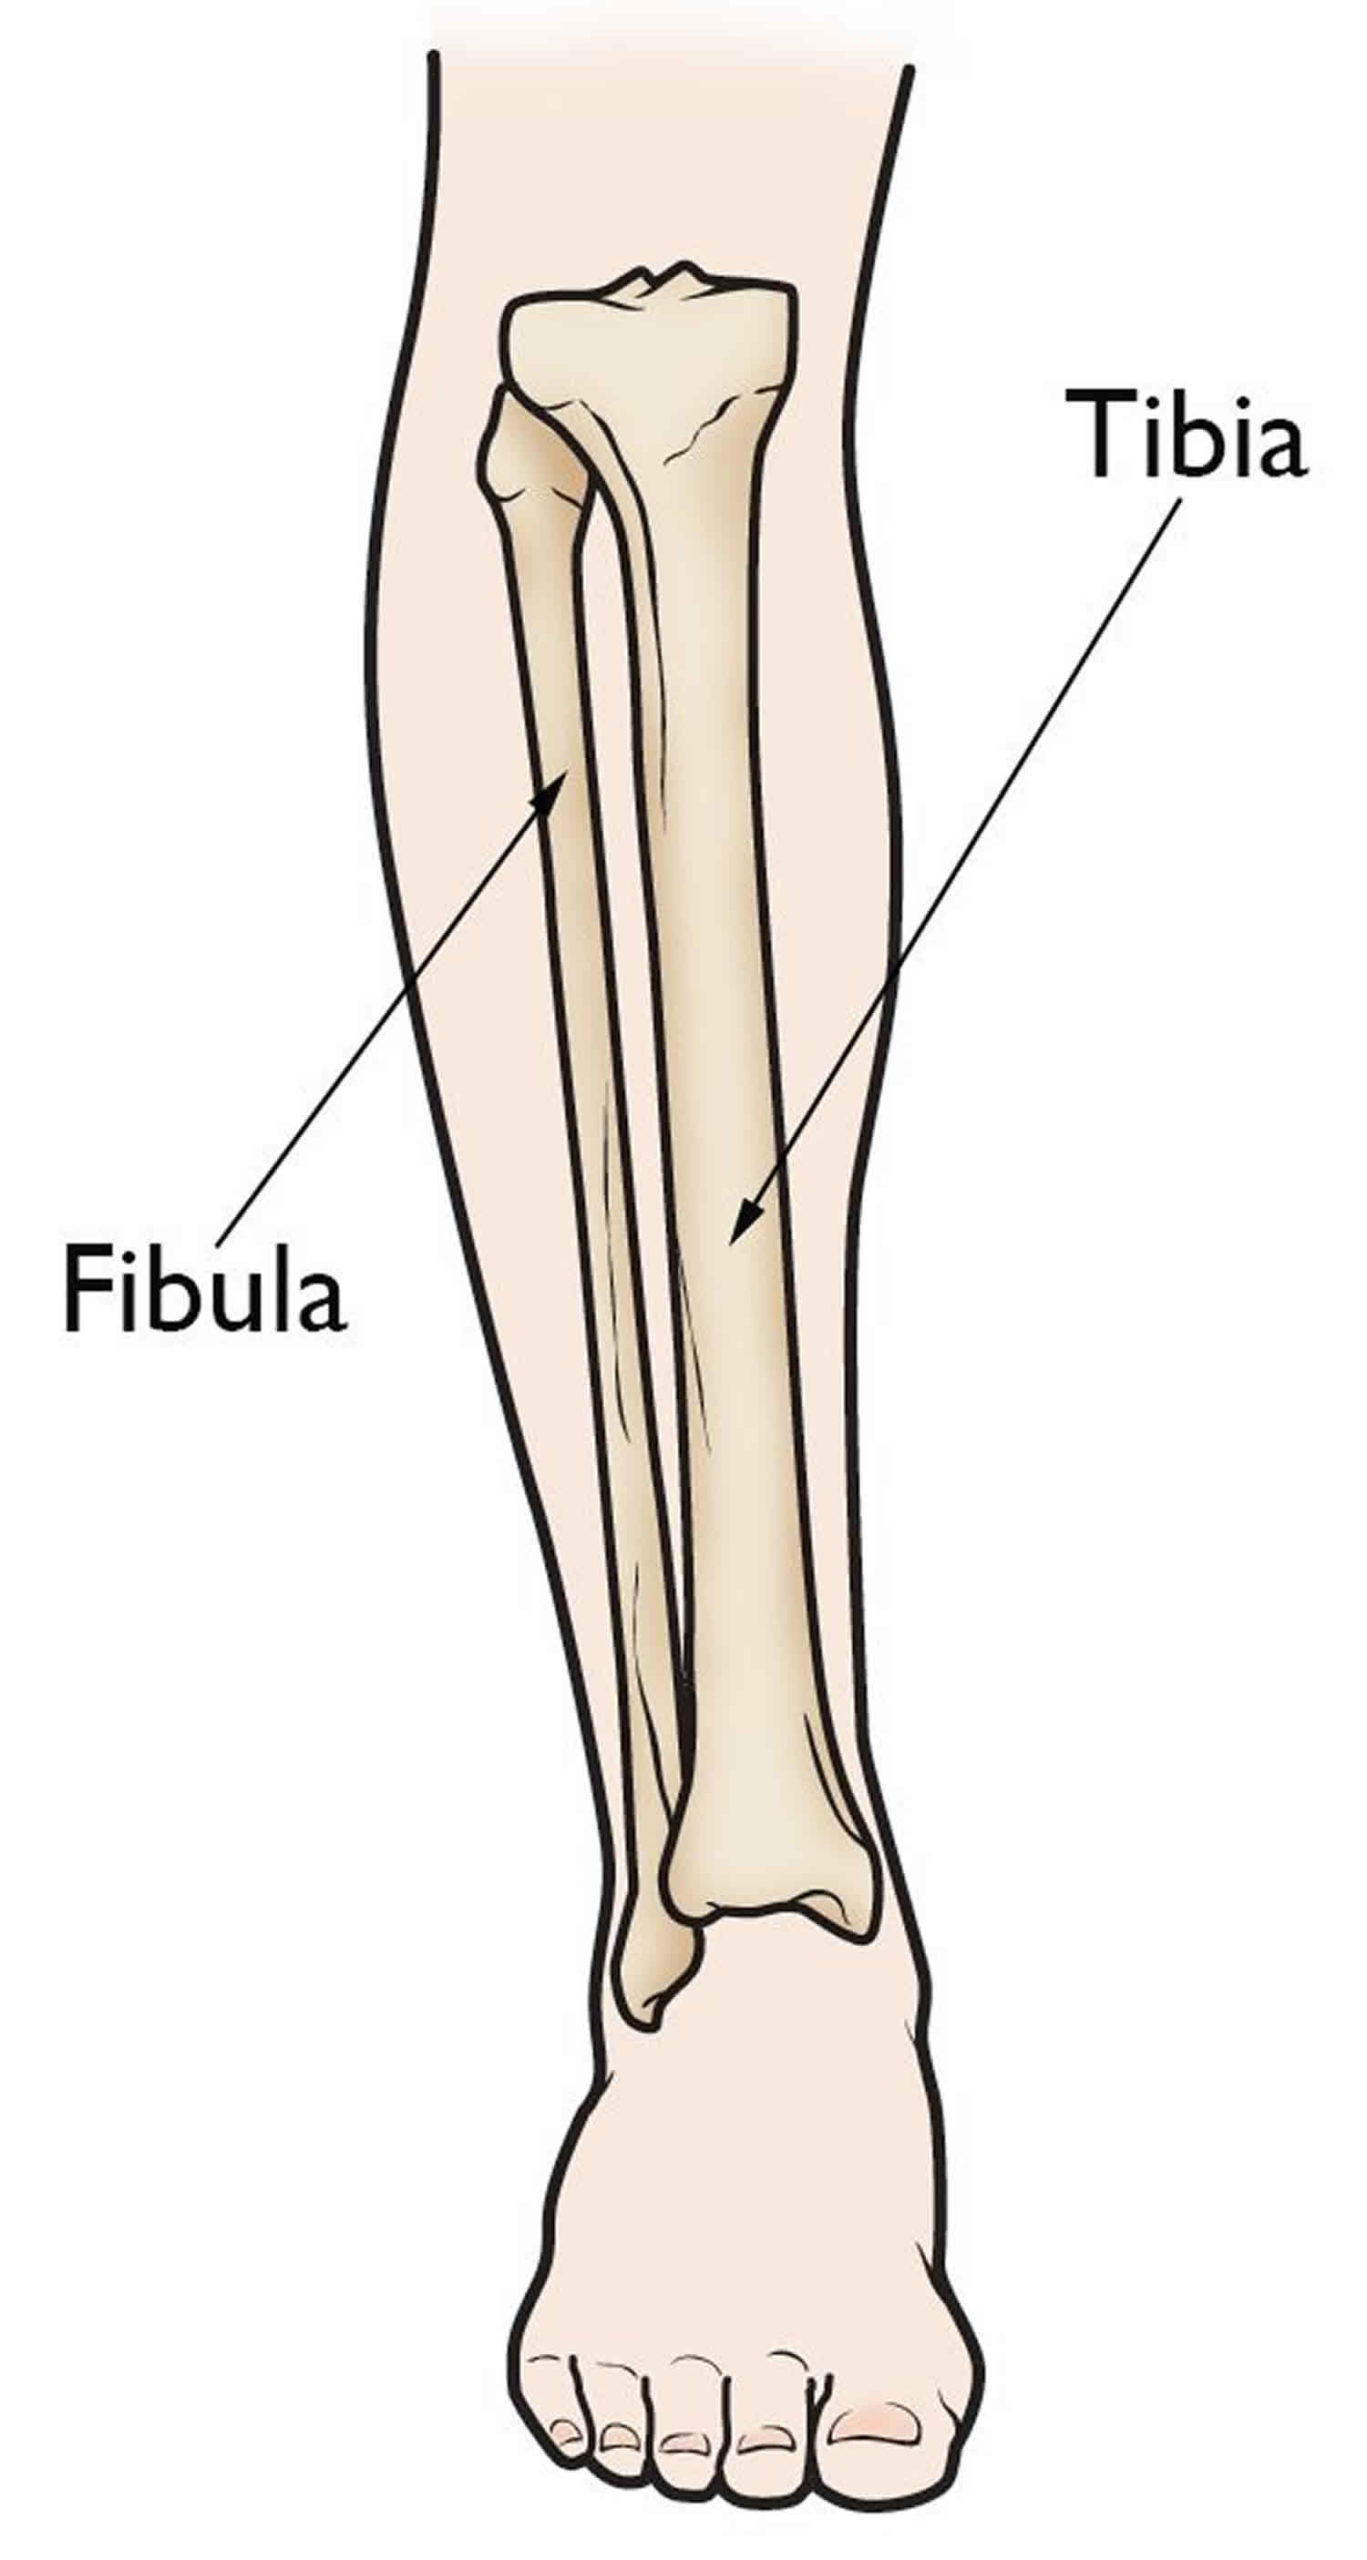 Normal leg bones